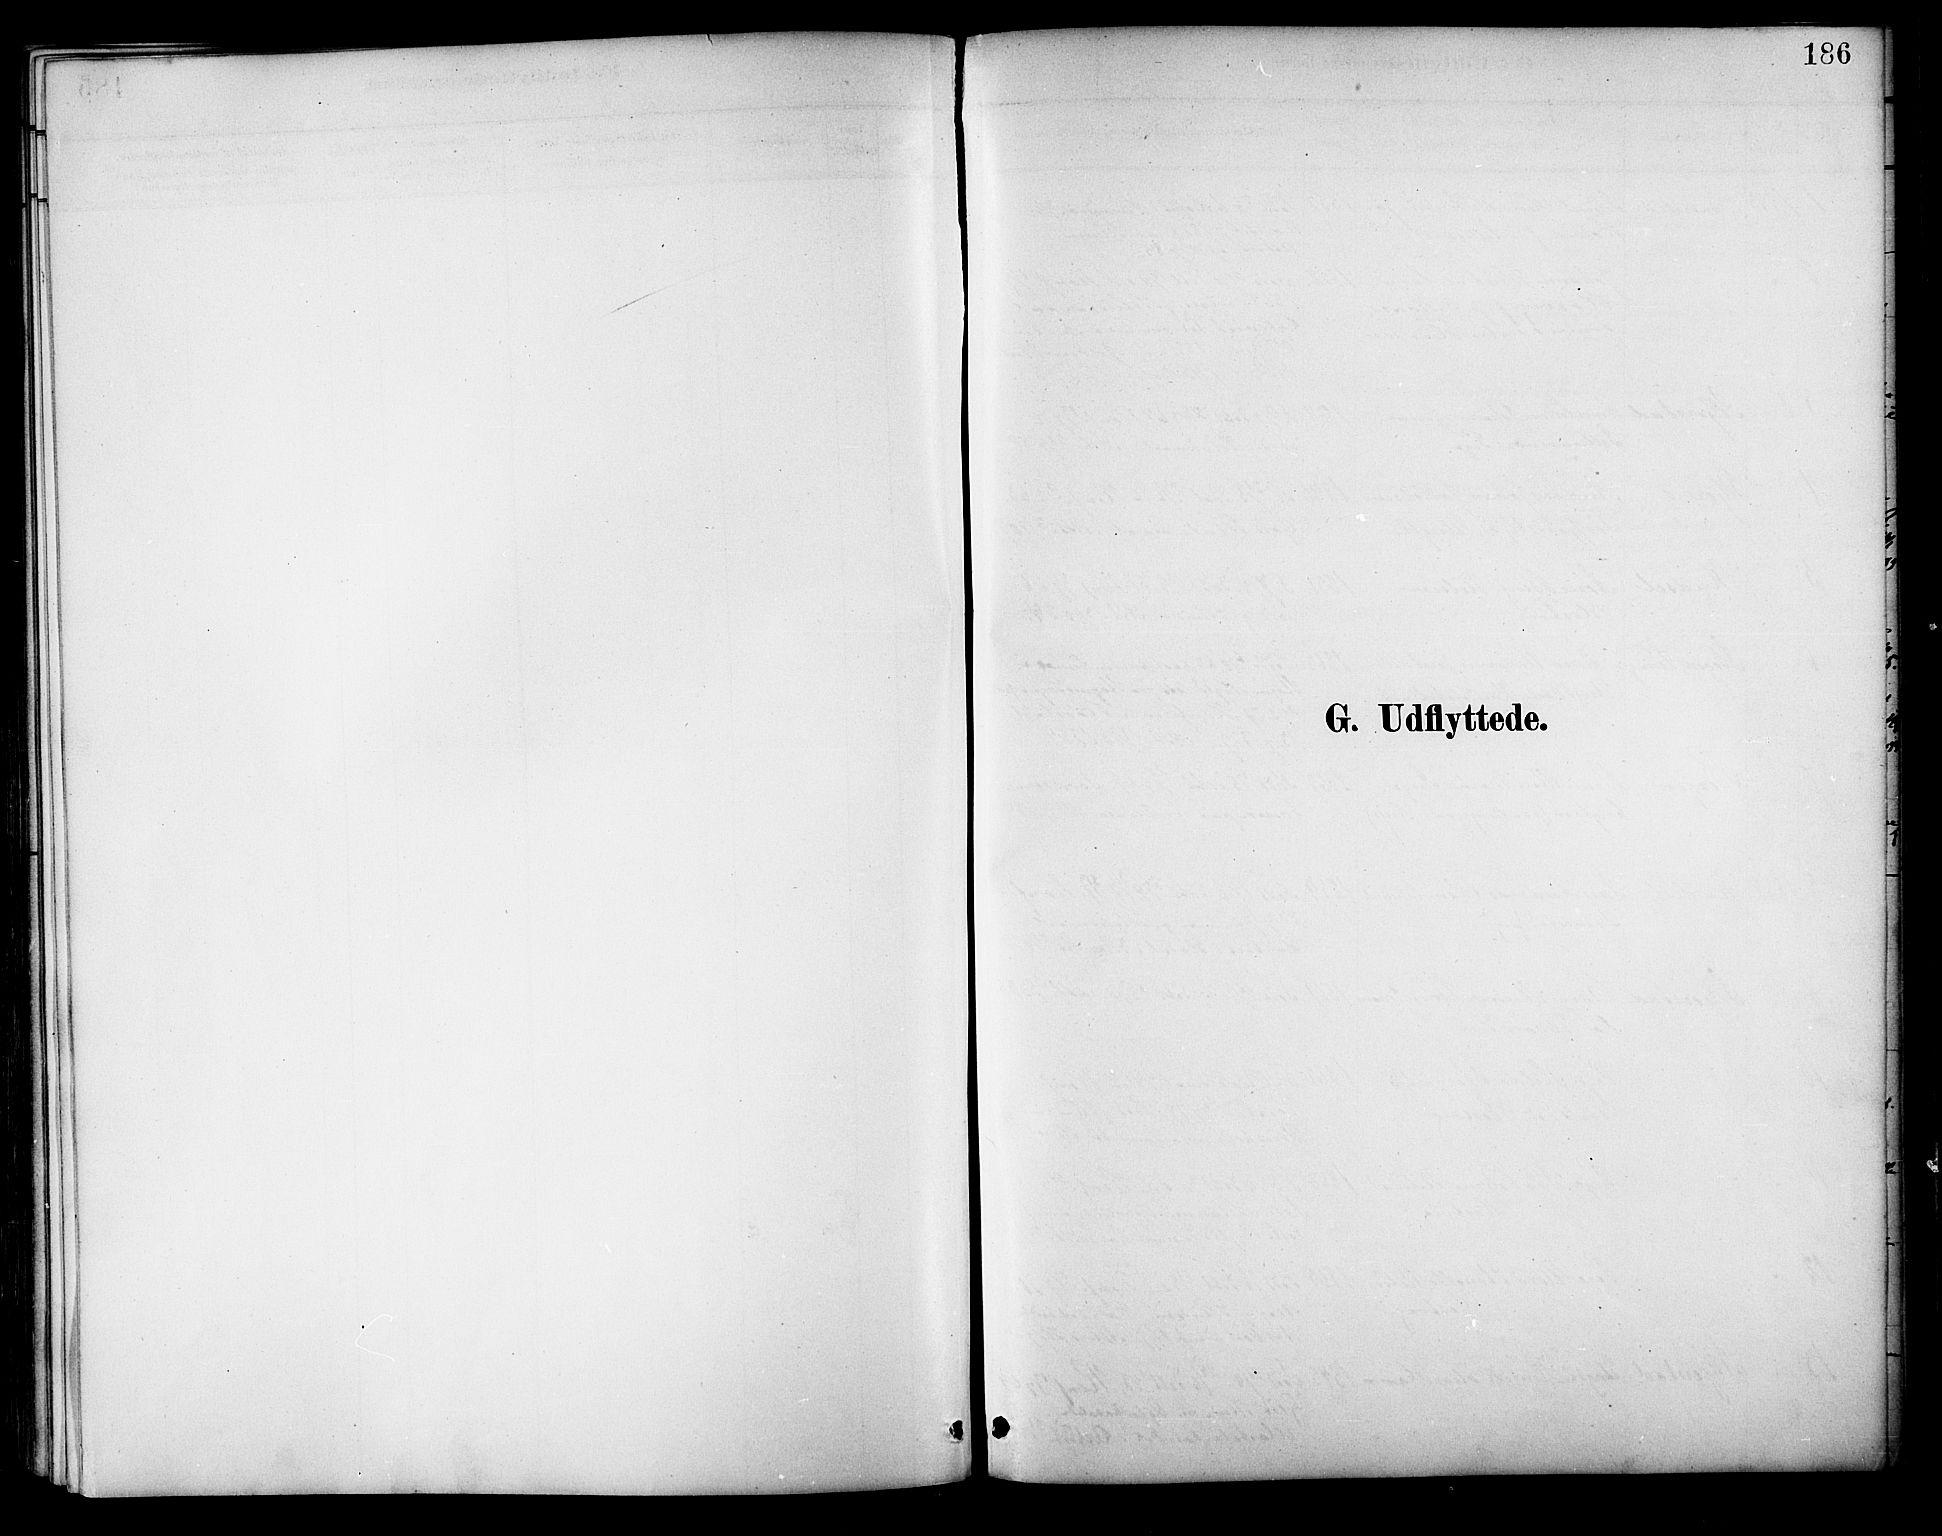 SAT, Ministerialprotokoller, klokkerbøker og fødselsregistre - Nordland, 854/L0777: Ministerialbok nr. 854A01 /1, 1883-1891, s. 186